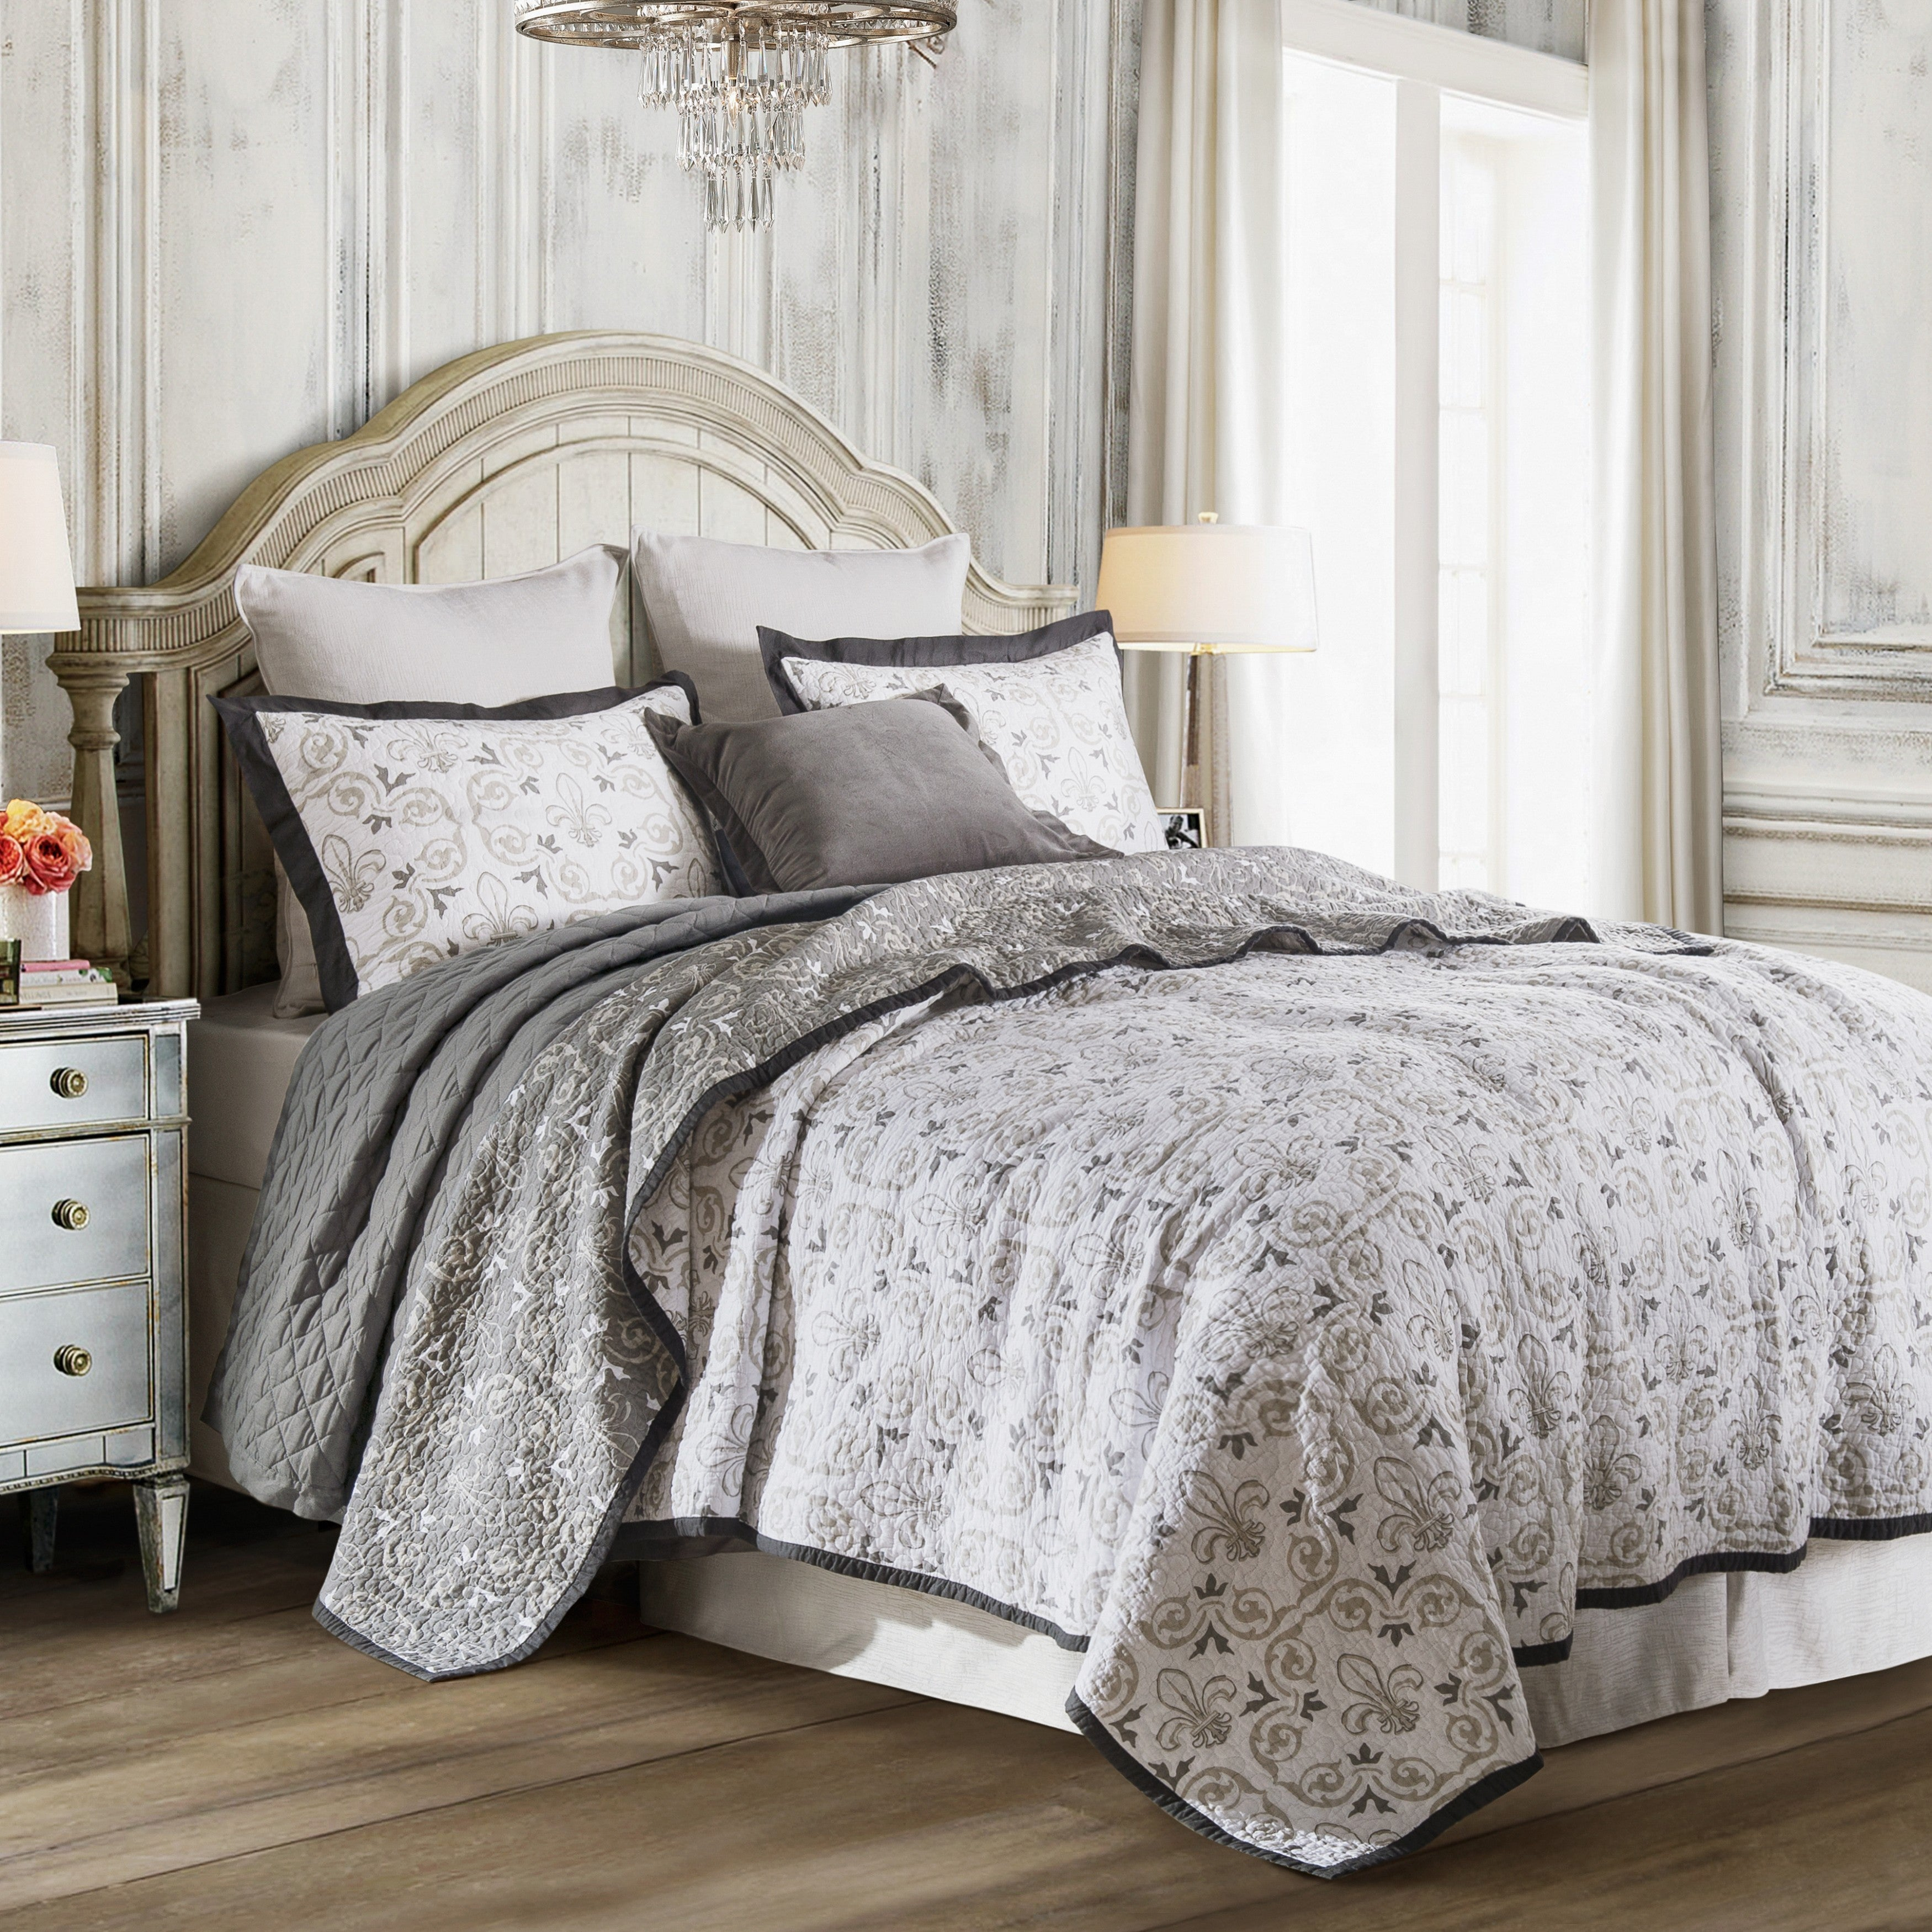 set king brown or de comforter queen fleur cream lis pin accents